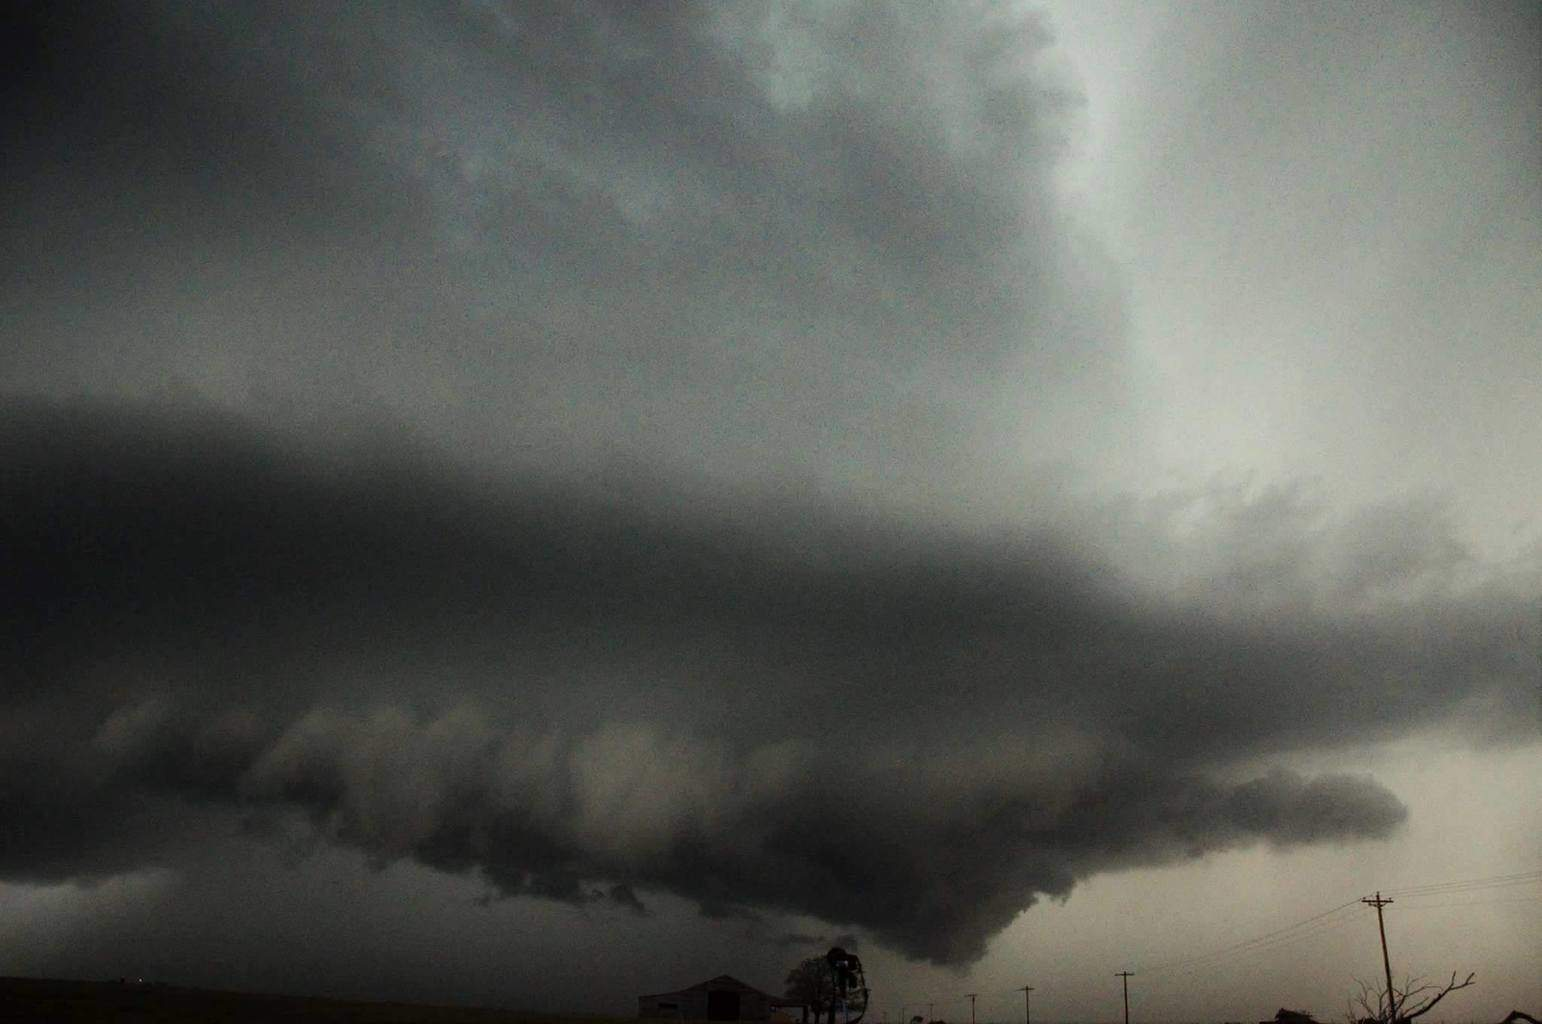 Mothership churns over sw oklahoma a couple weeks ago